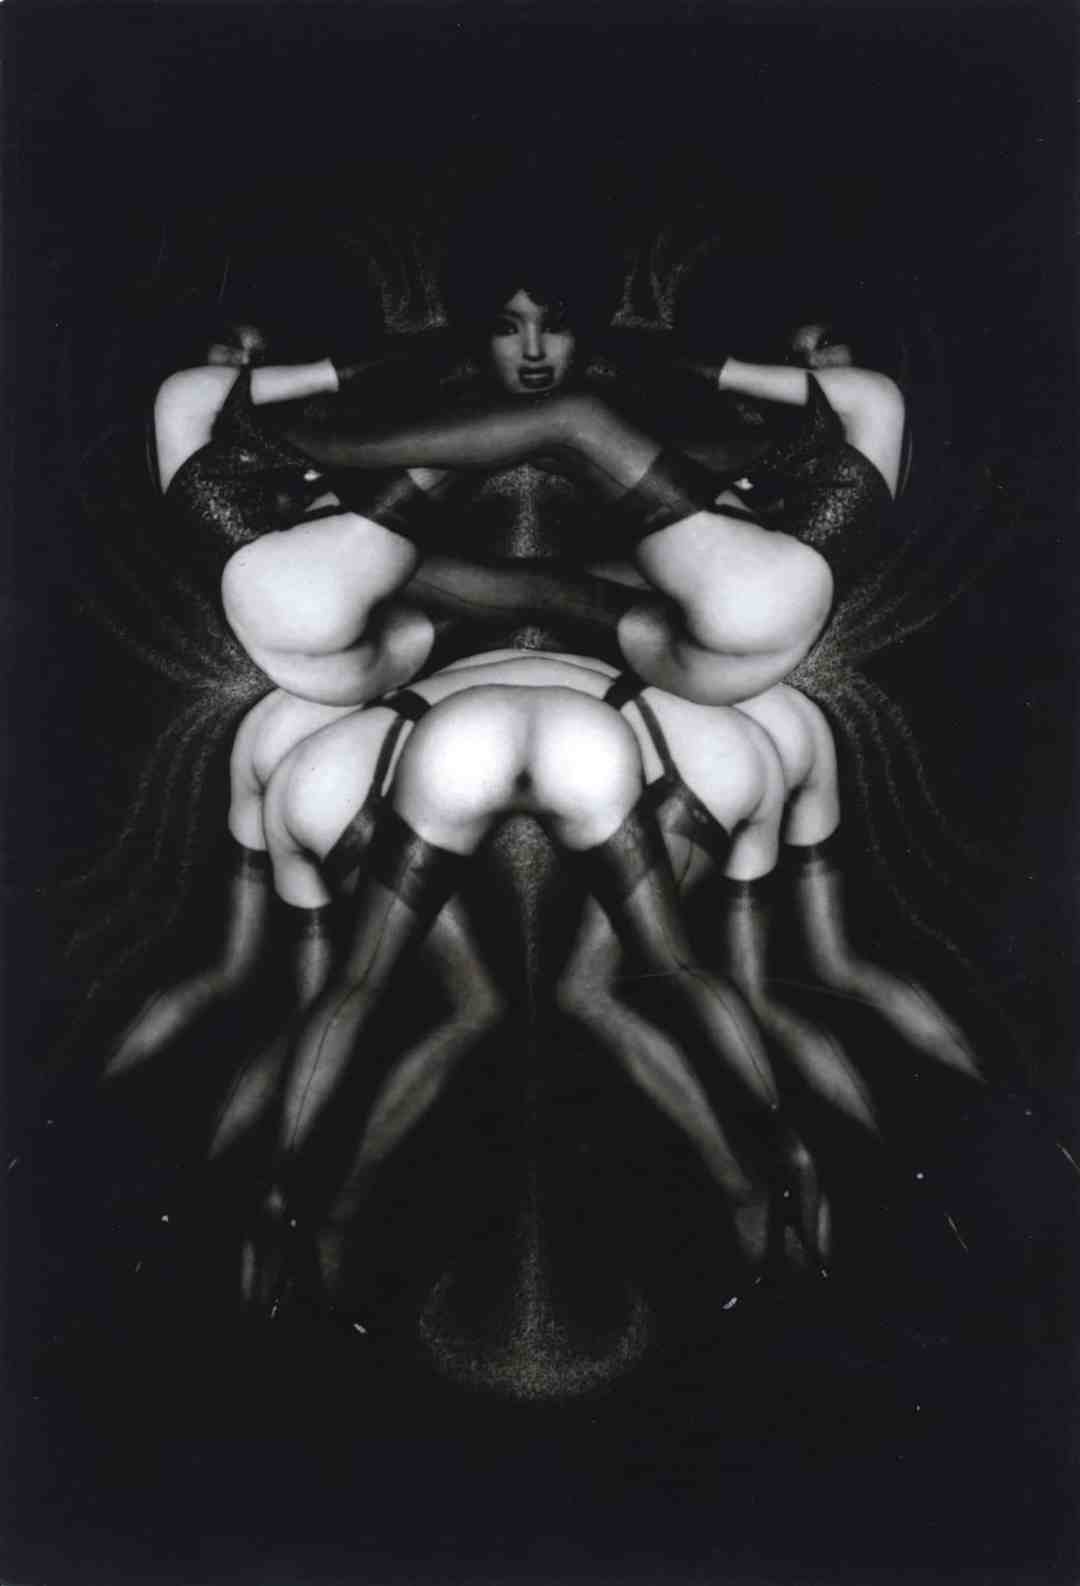 Pierre Molinier, Le triomphe des tribades ou sur le pavois, 1968, cm 21x15, vintage gelatin silver print (photomontage), Courtesy Collezione Ettore Molinario, ©Comité Pierre Molinier